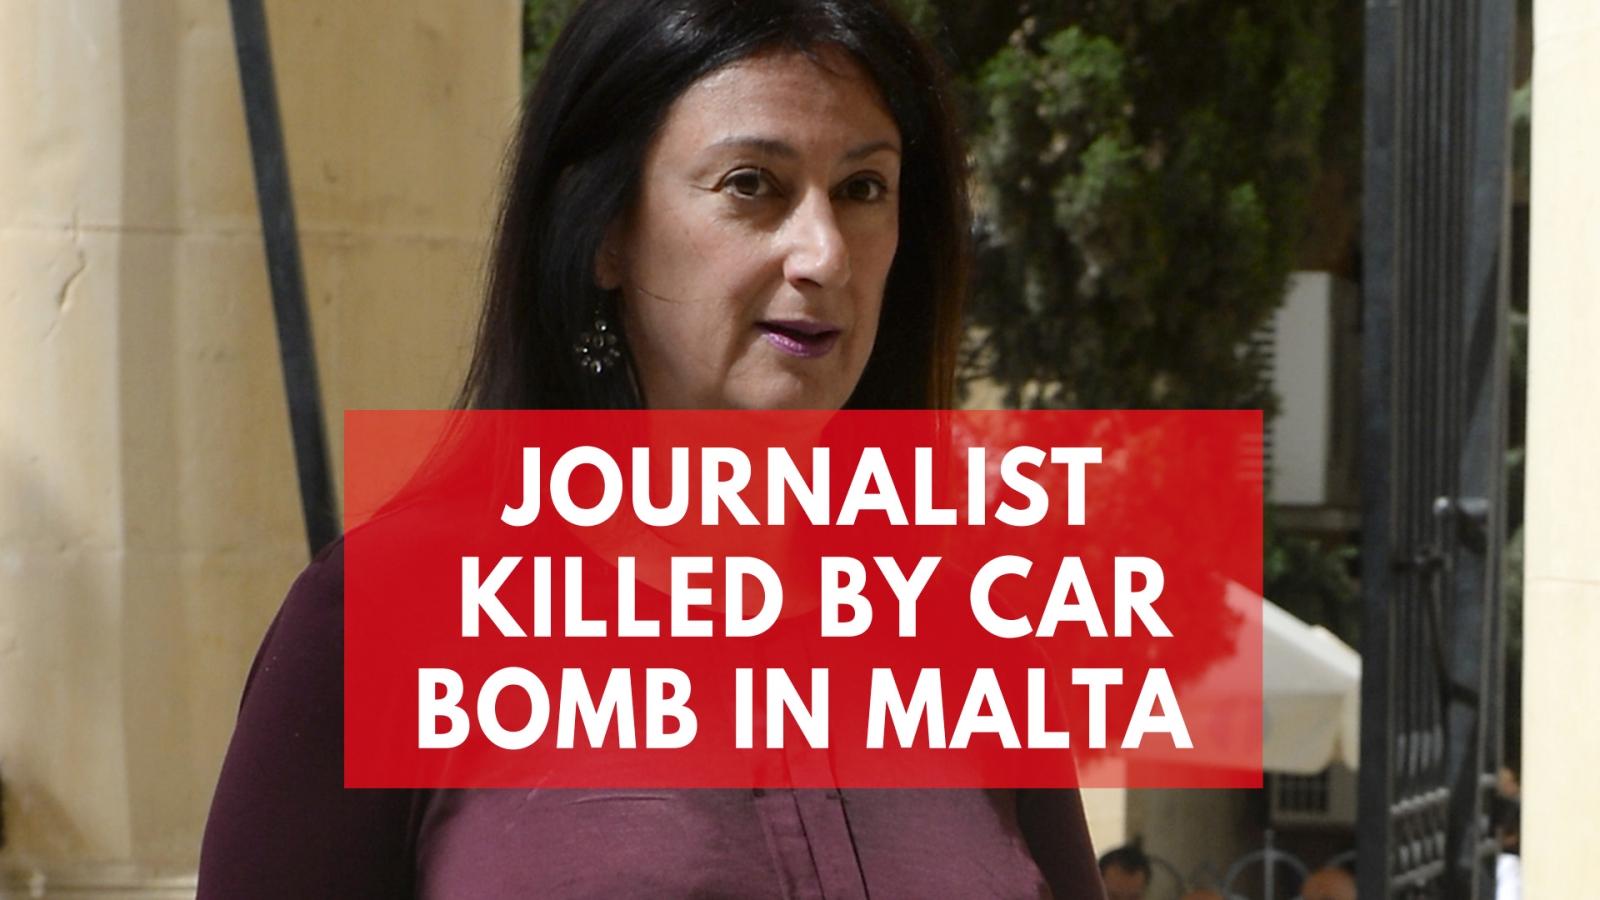 Prominent Journalist Daphne Caruana Galizia Dies In Car Bomb Attack In Malta